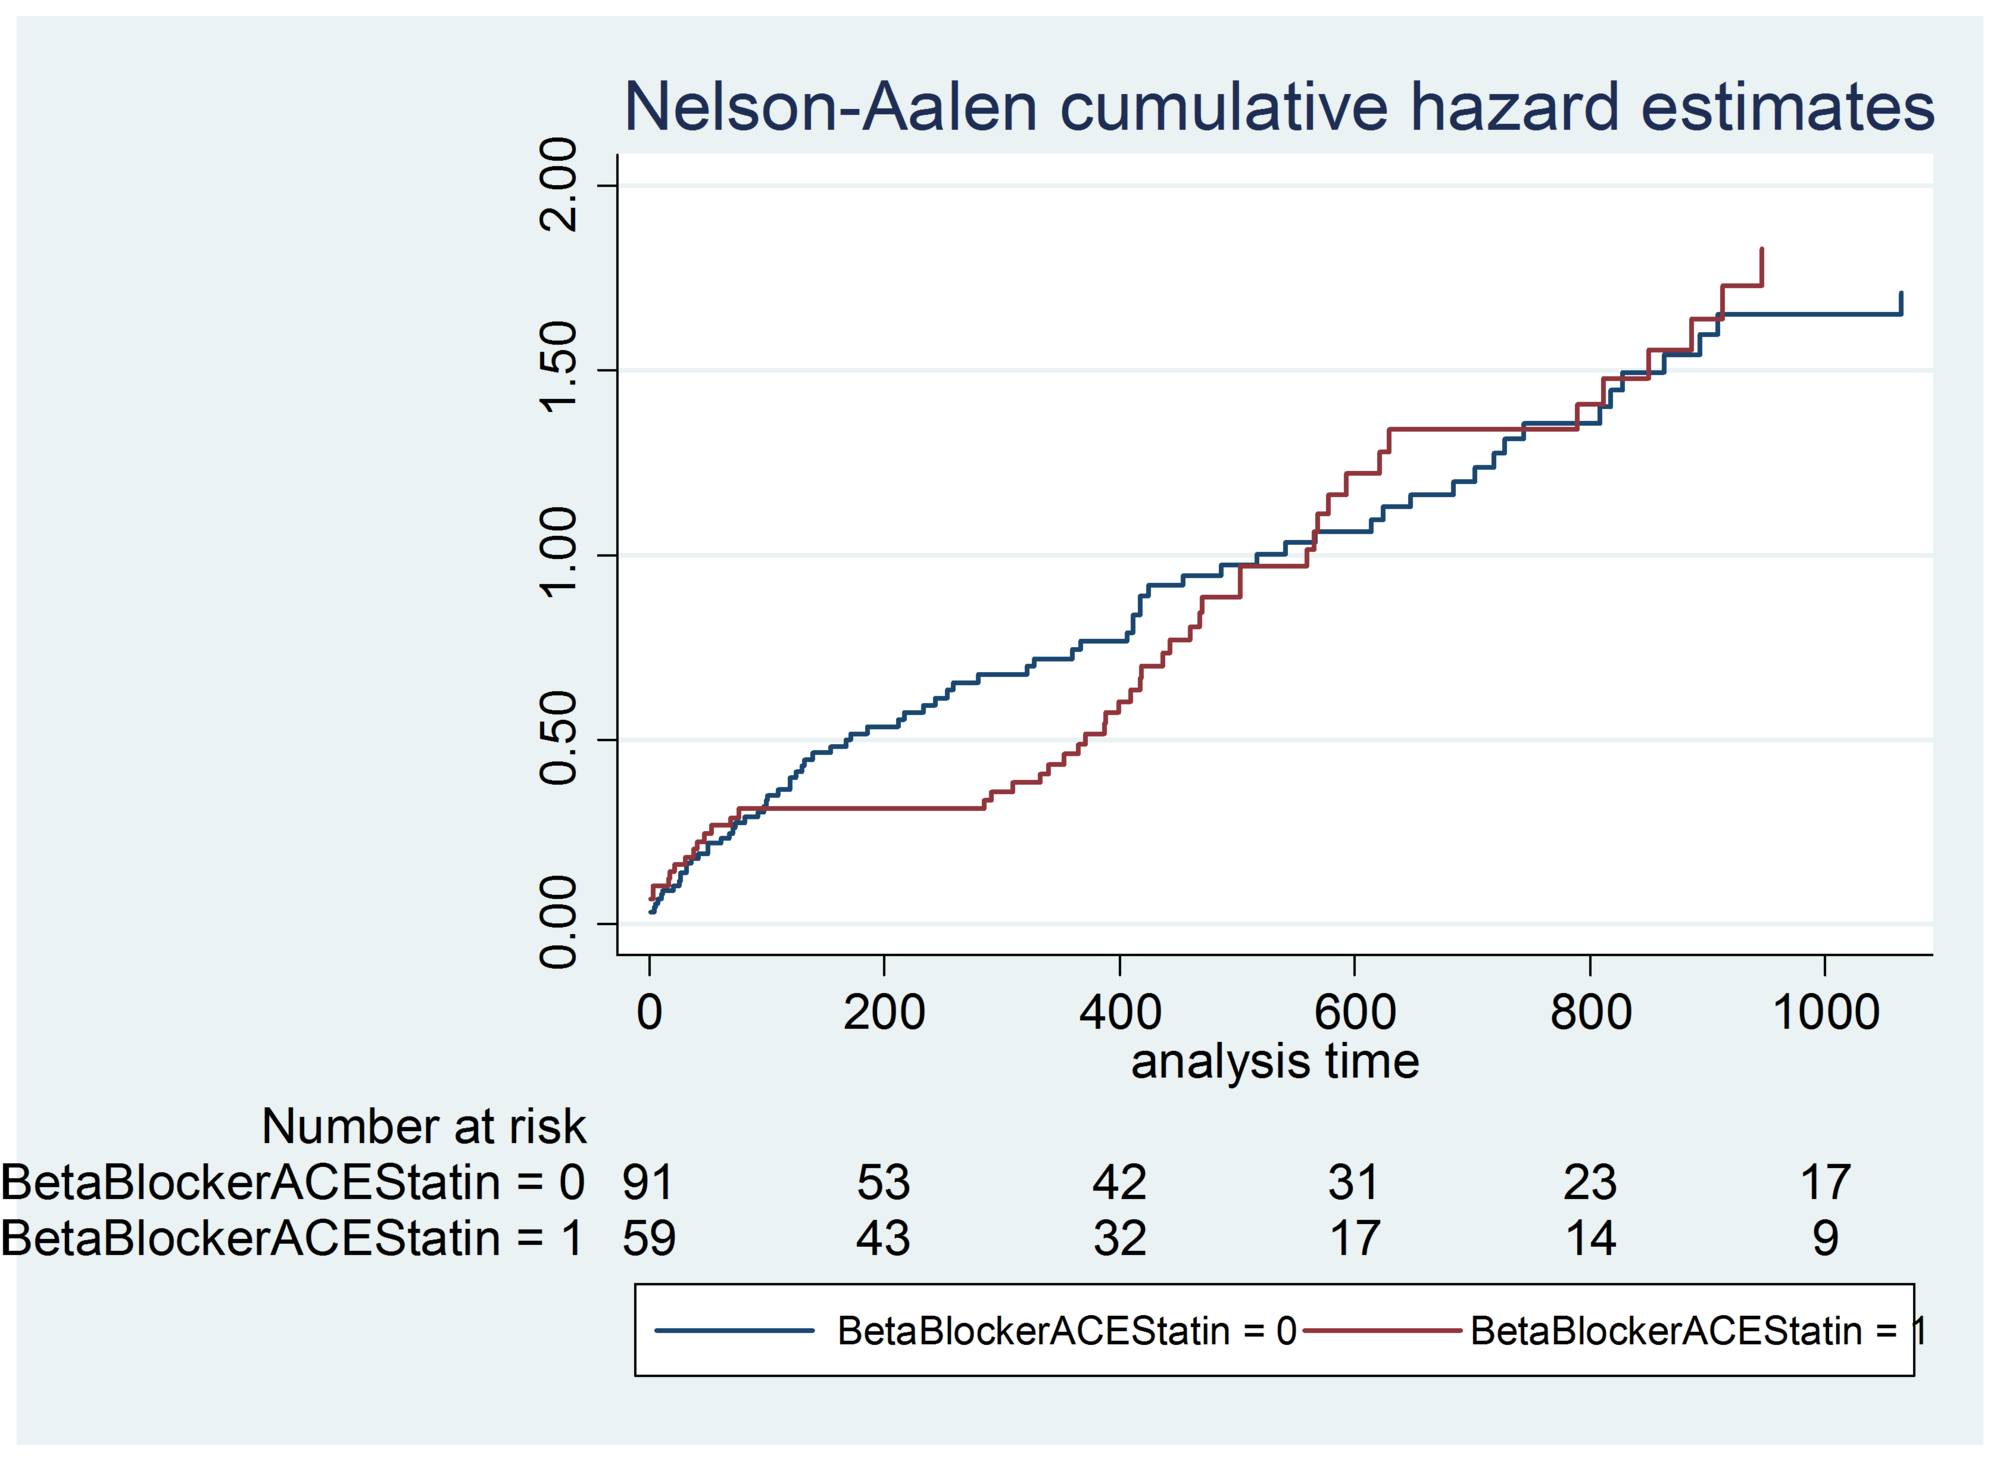 Beta-blocker-+-ACE-inhibitor-+-statin-hazard-ratios